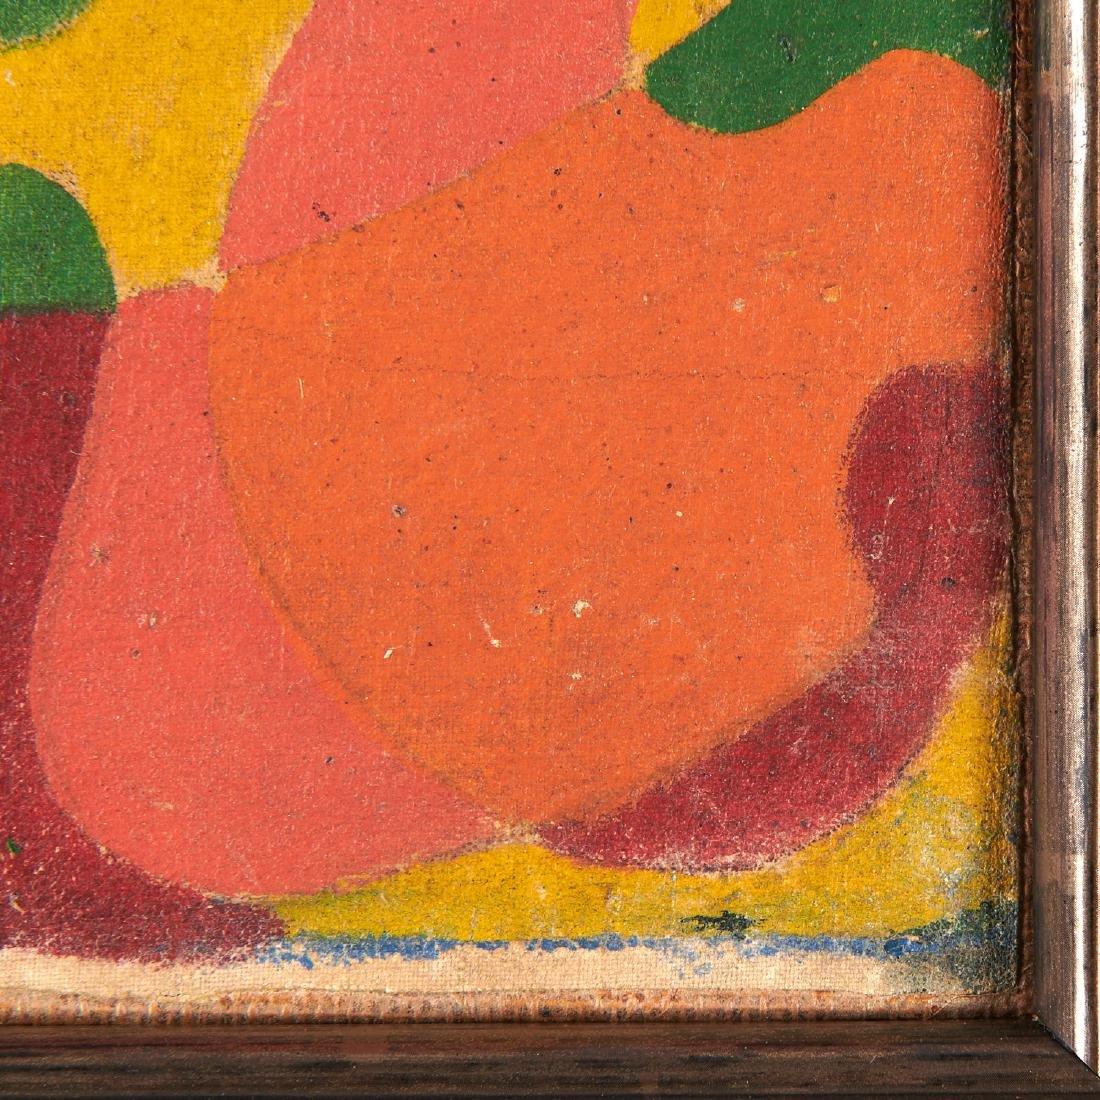 Giacomo Balla, painting, dated 1914 - 6